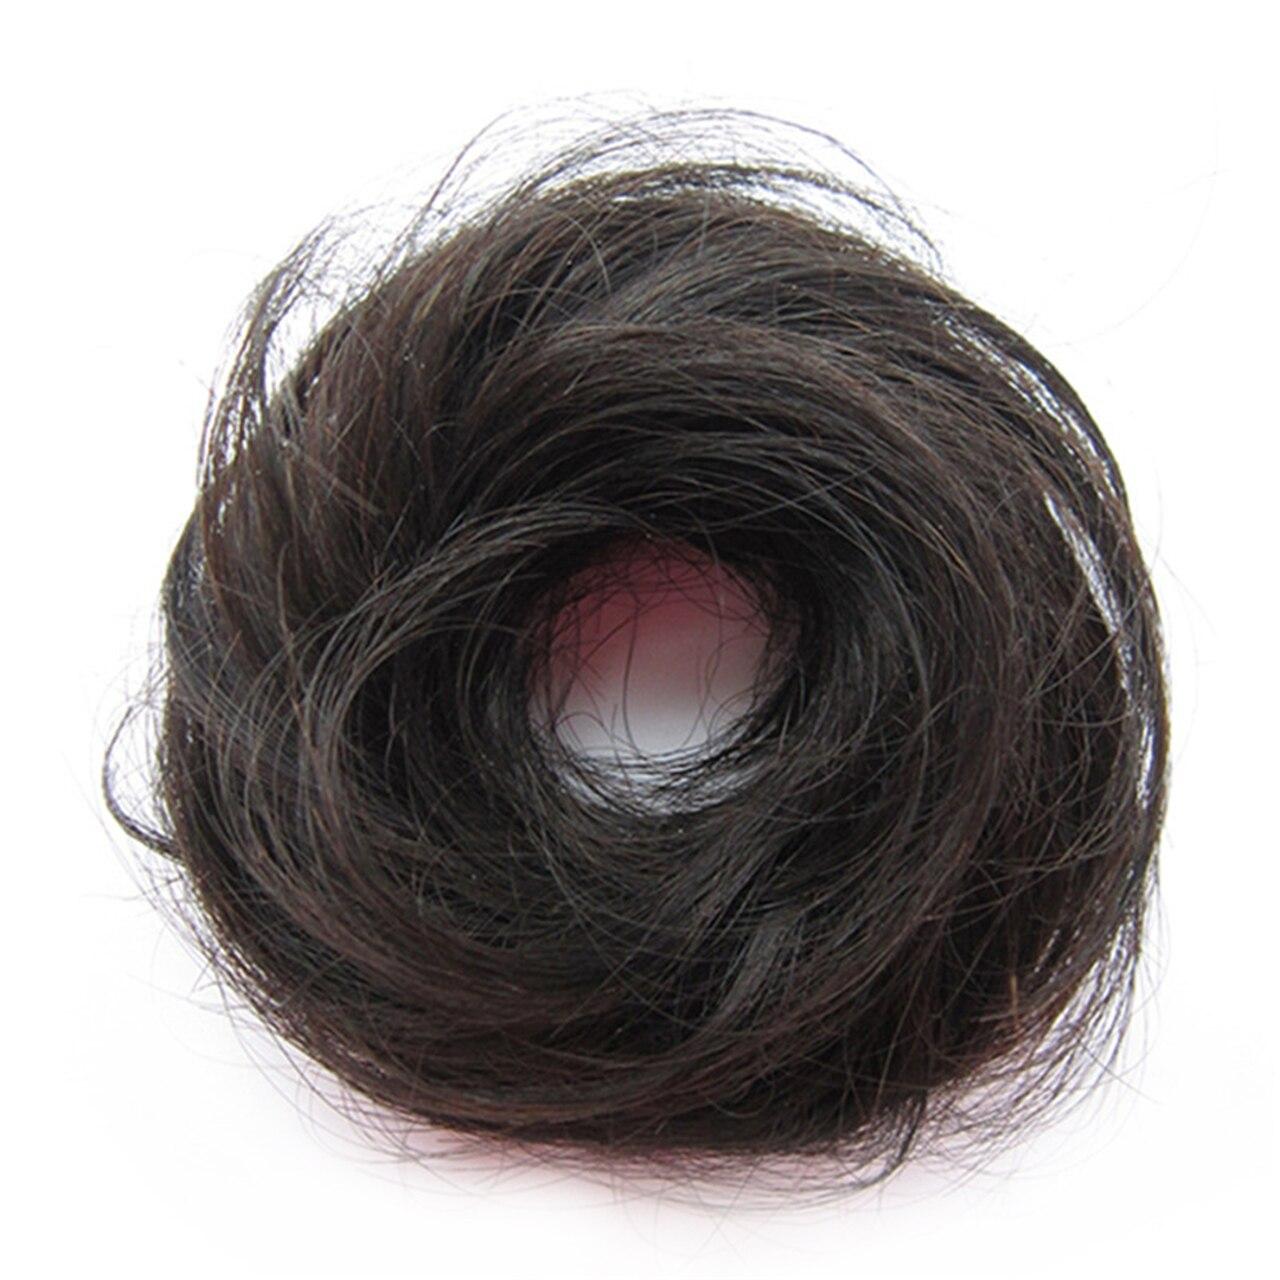 The Original Man Bun Instant Clip On Bun 100% Human Hair Extension 8